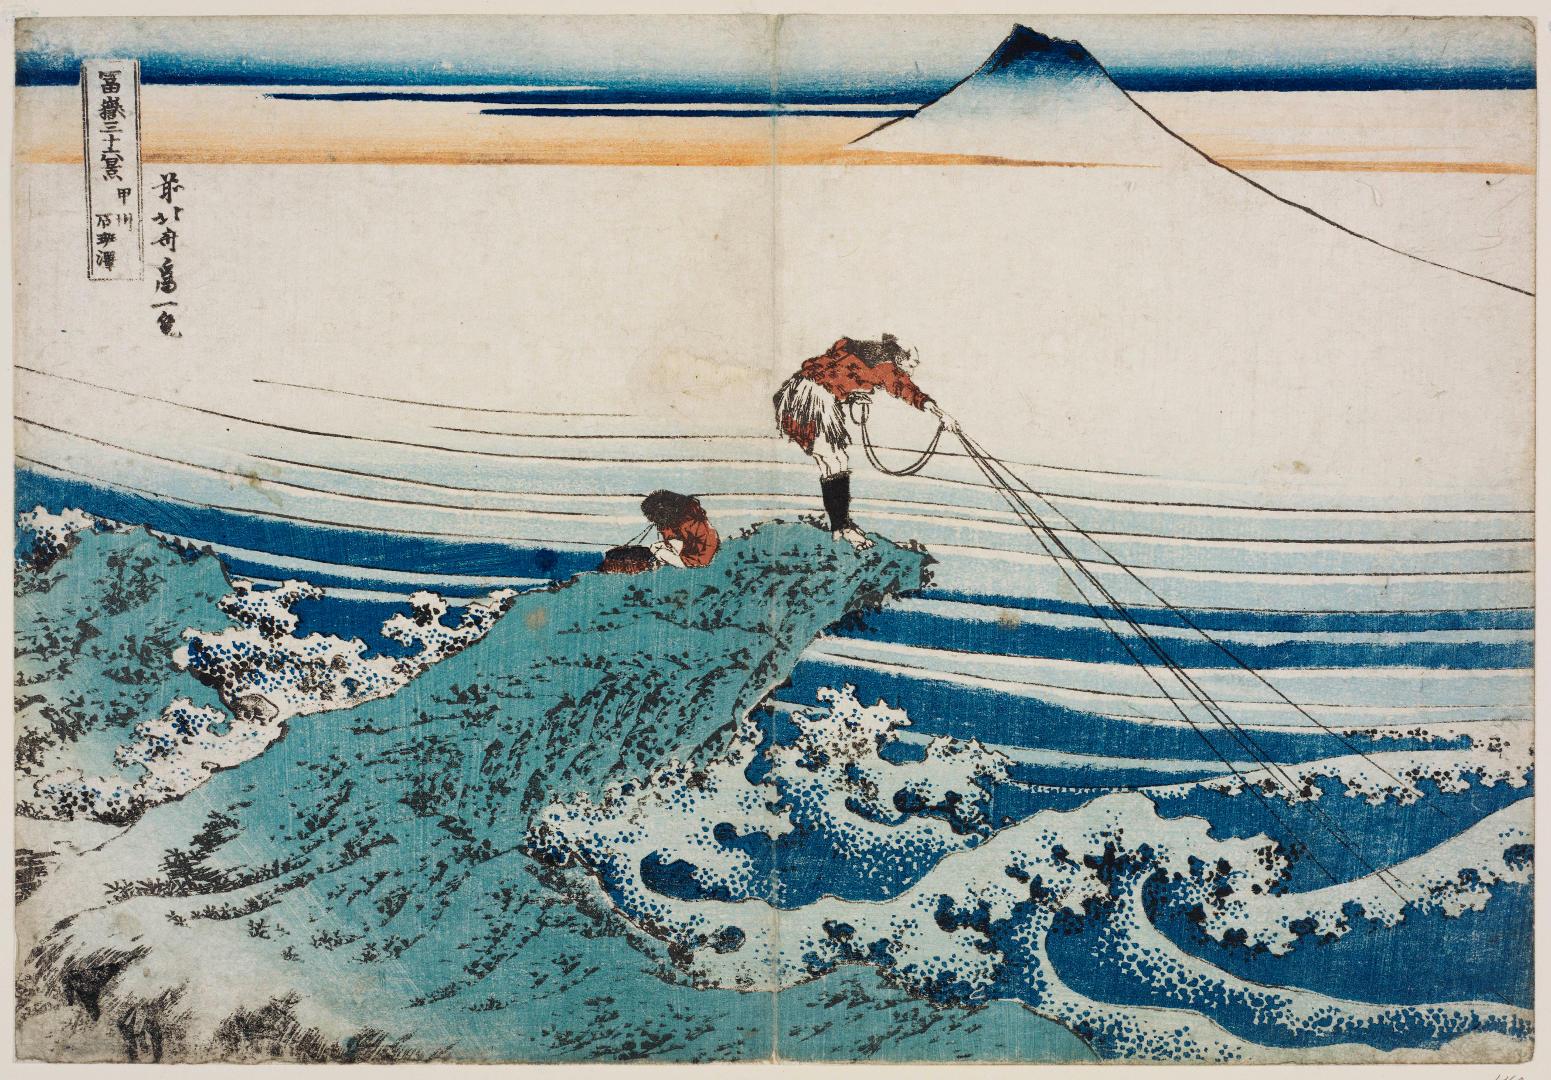 Katsushika Hokusai, Kajikazawa nella provincia di Kai, 1830-31, silografia policroma